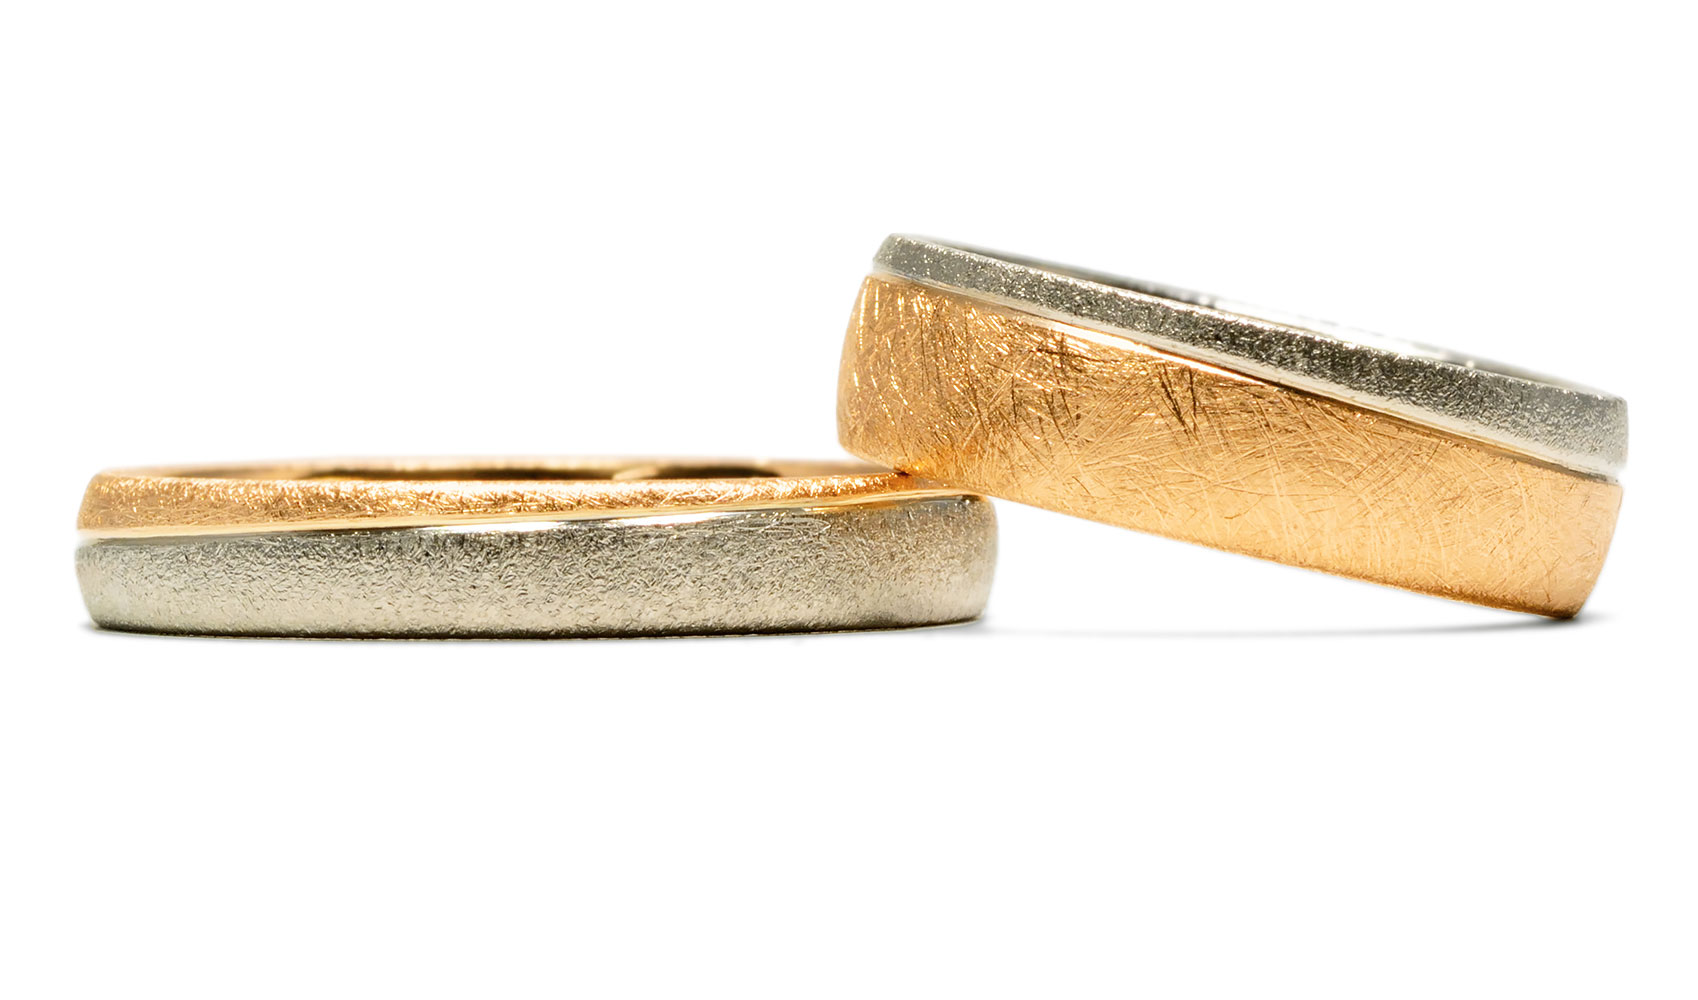 GOLDAFFAIRS - Zweifarbige Ringe - Eheringe aus Fair Trade Gold